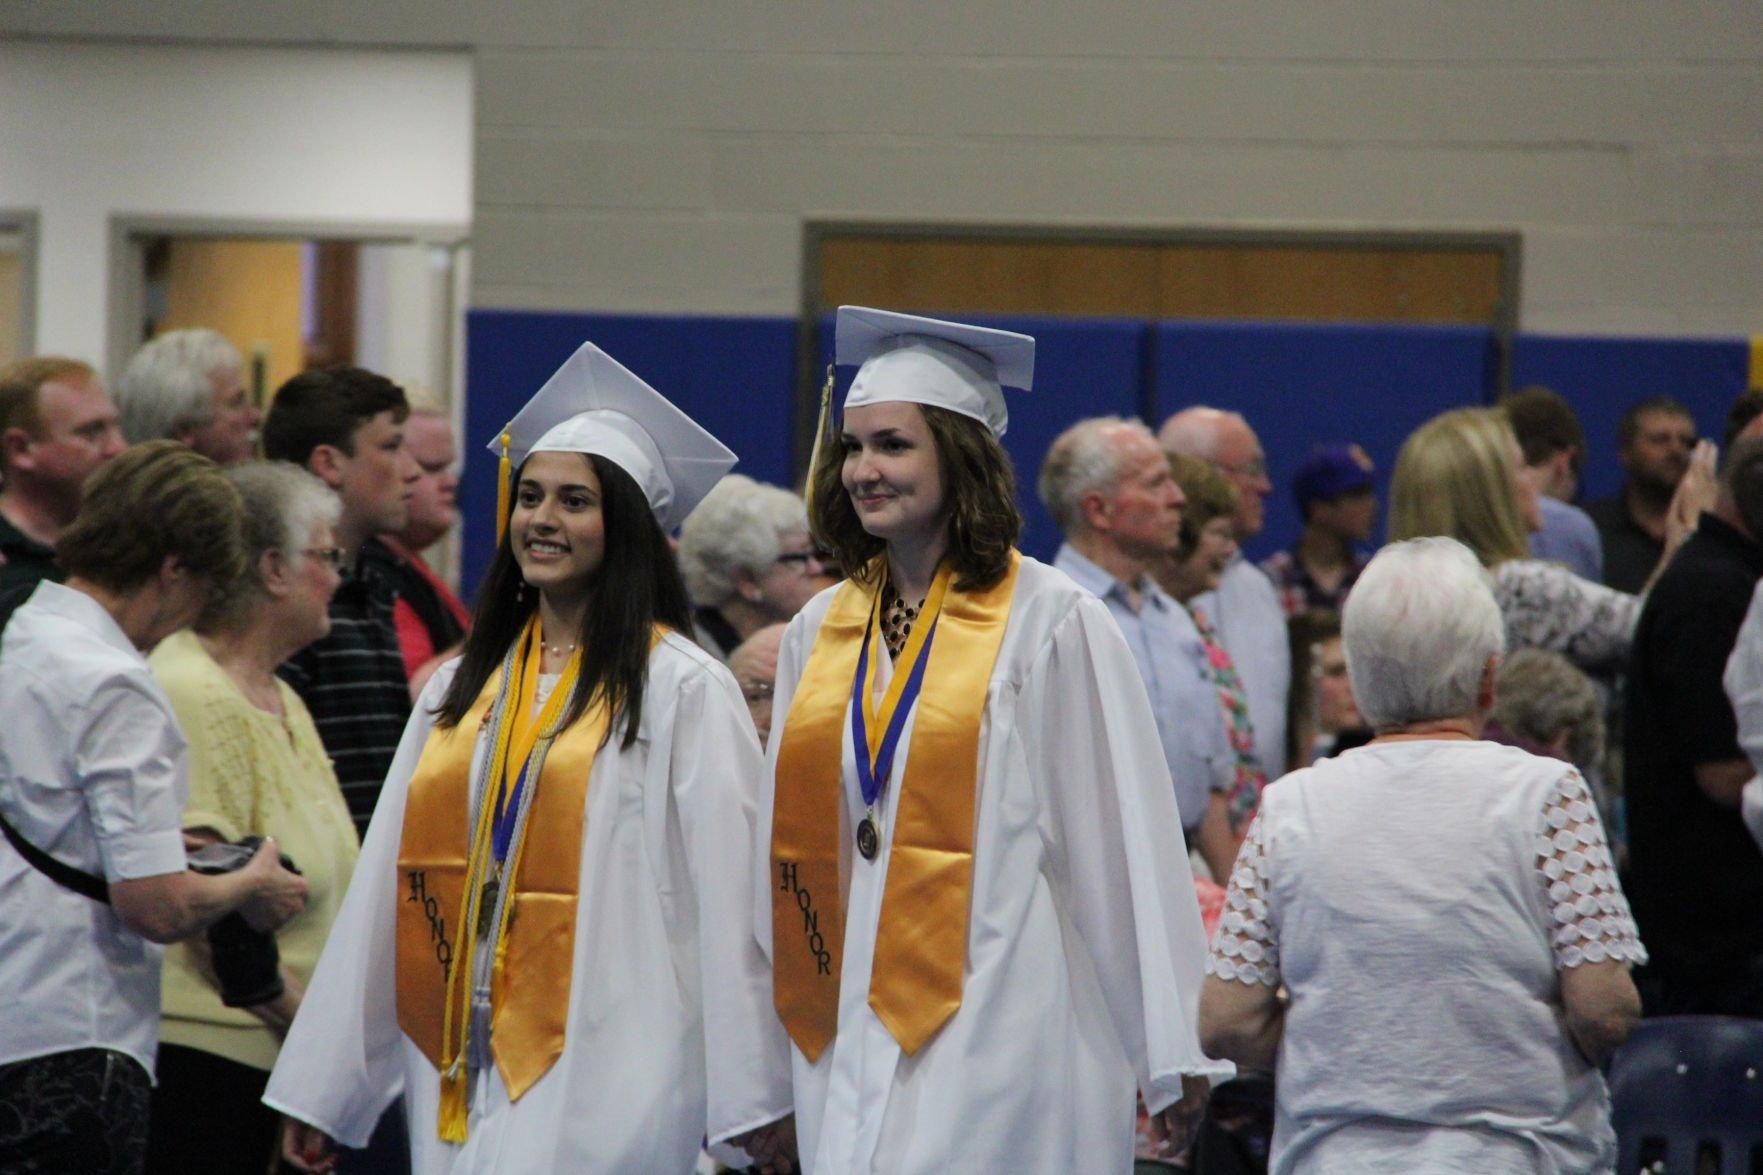 Ontario High School 2018 graduation